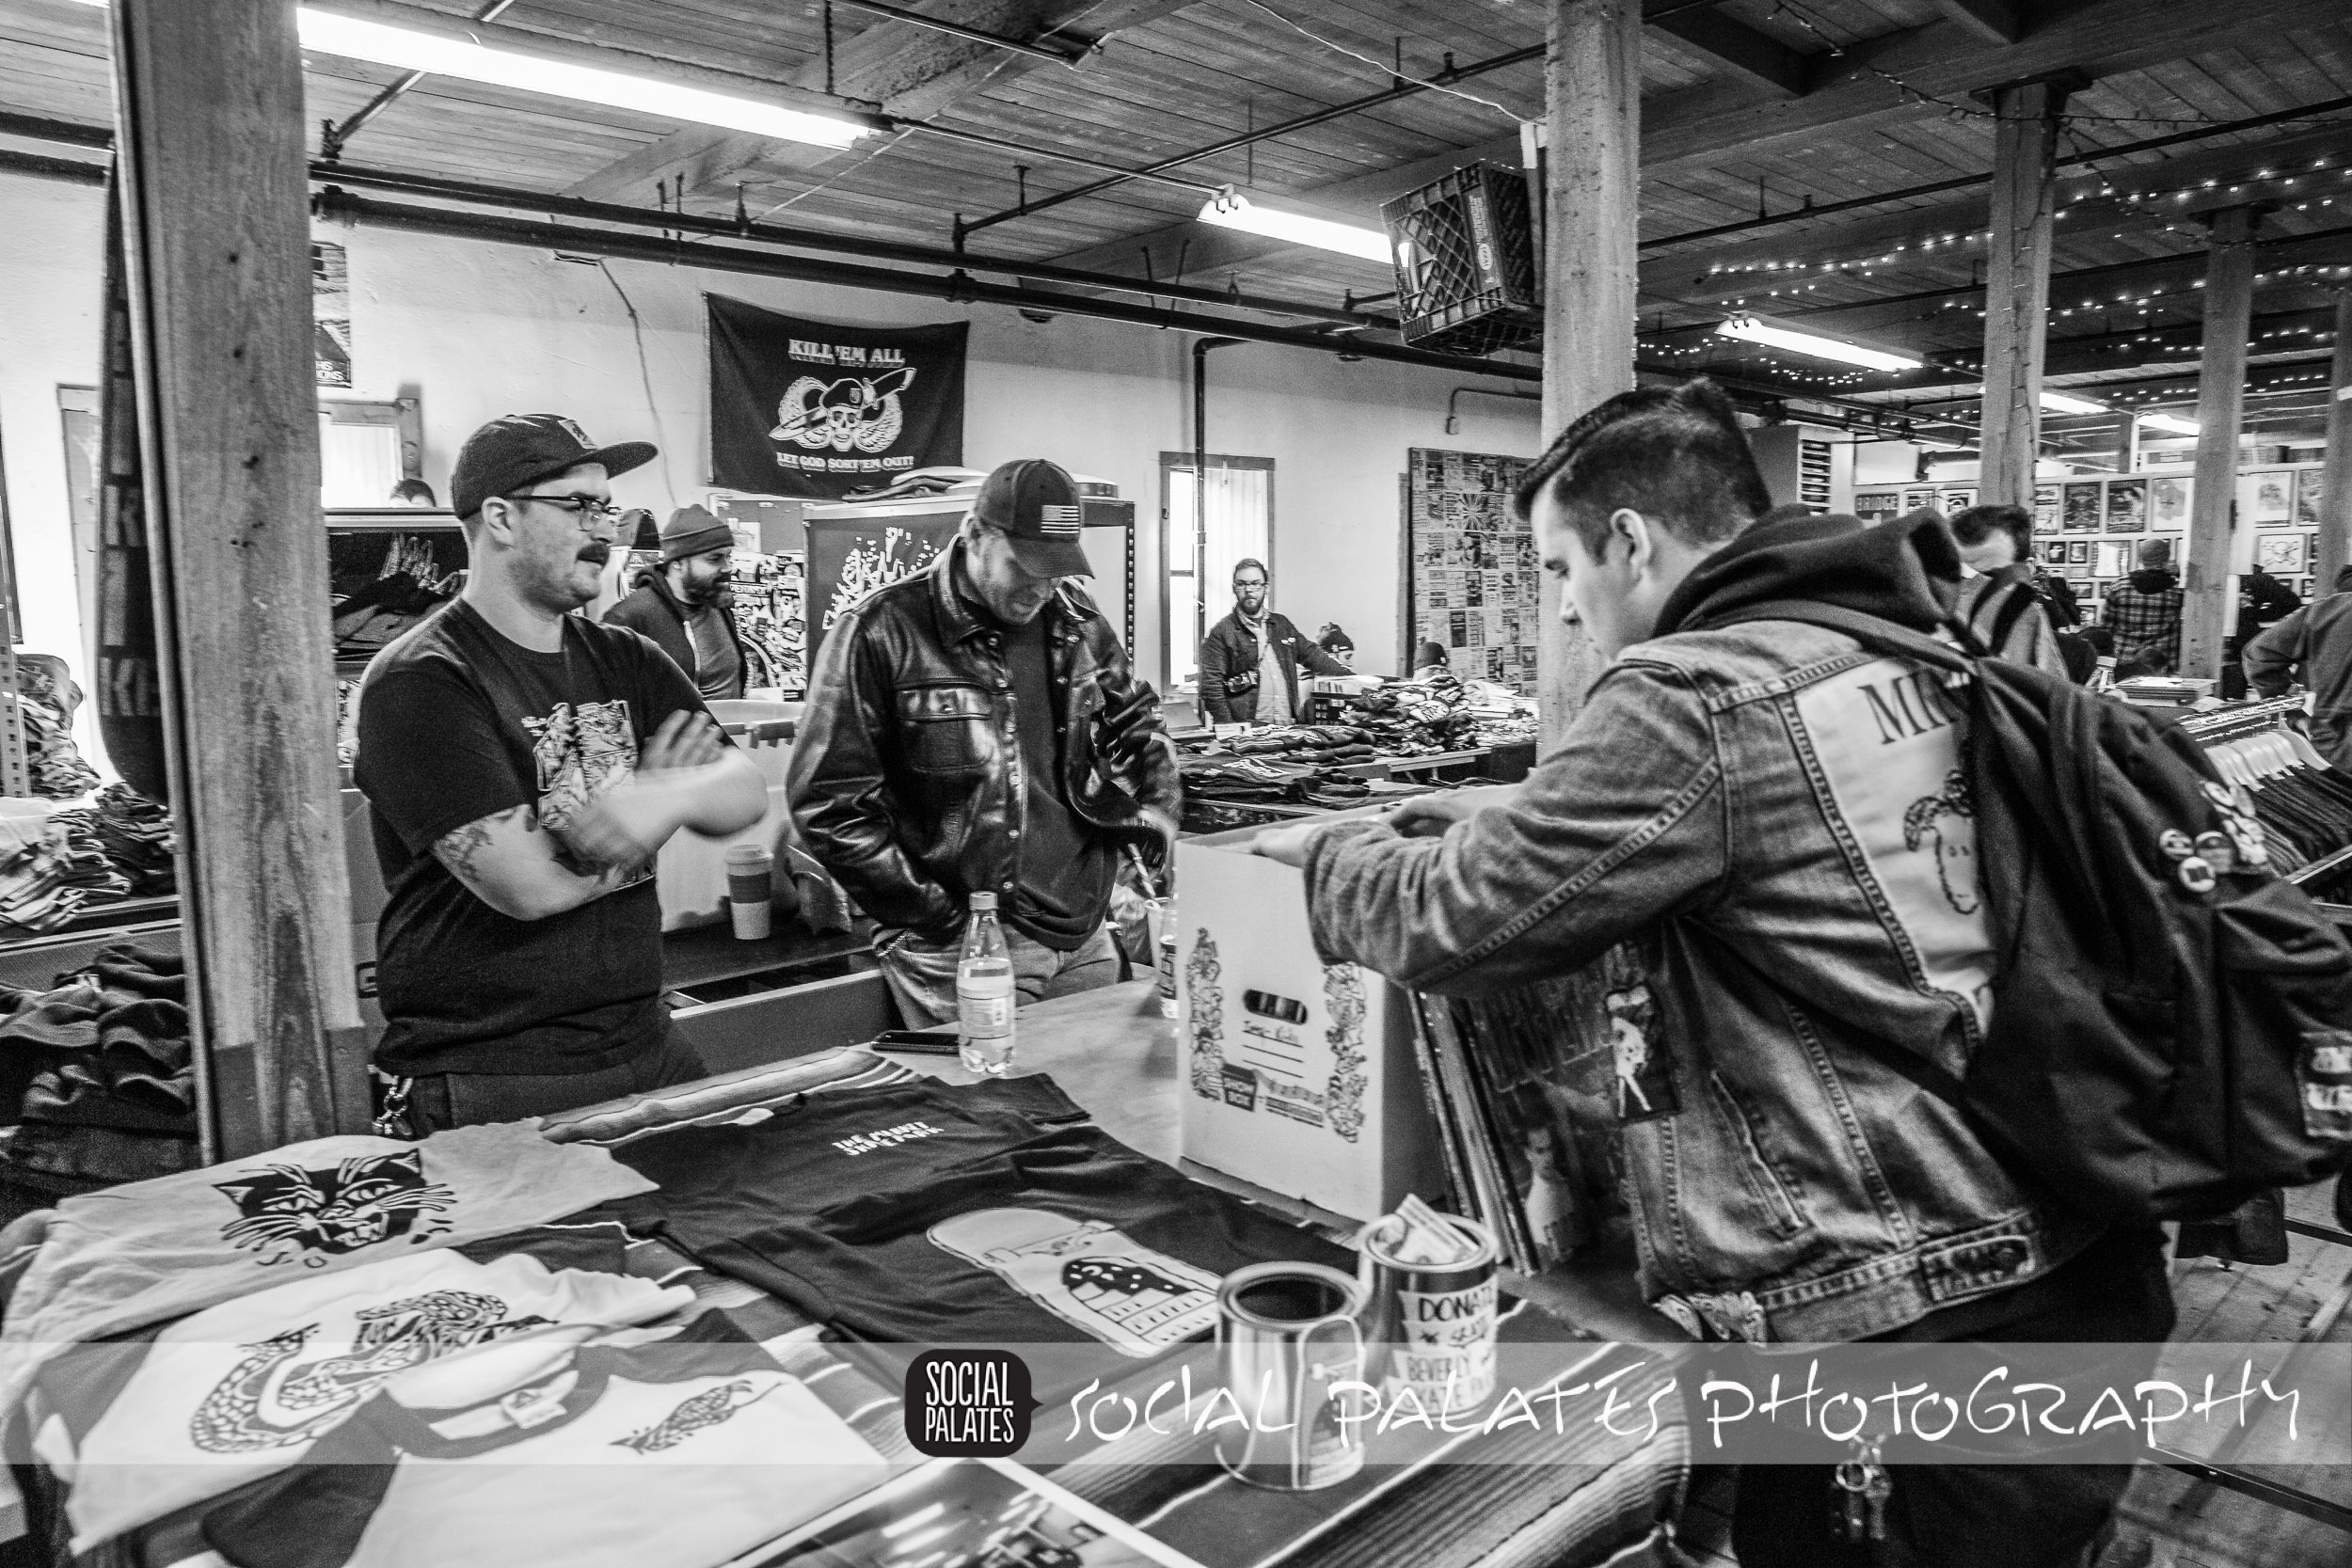 Bridge Nine Punk Rock Flea Market Social Palates-5434.jpg